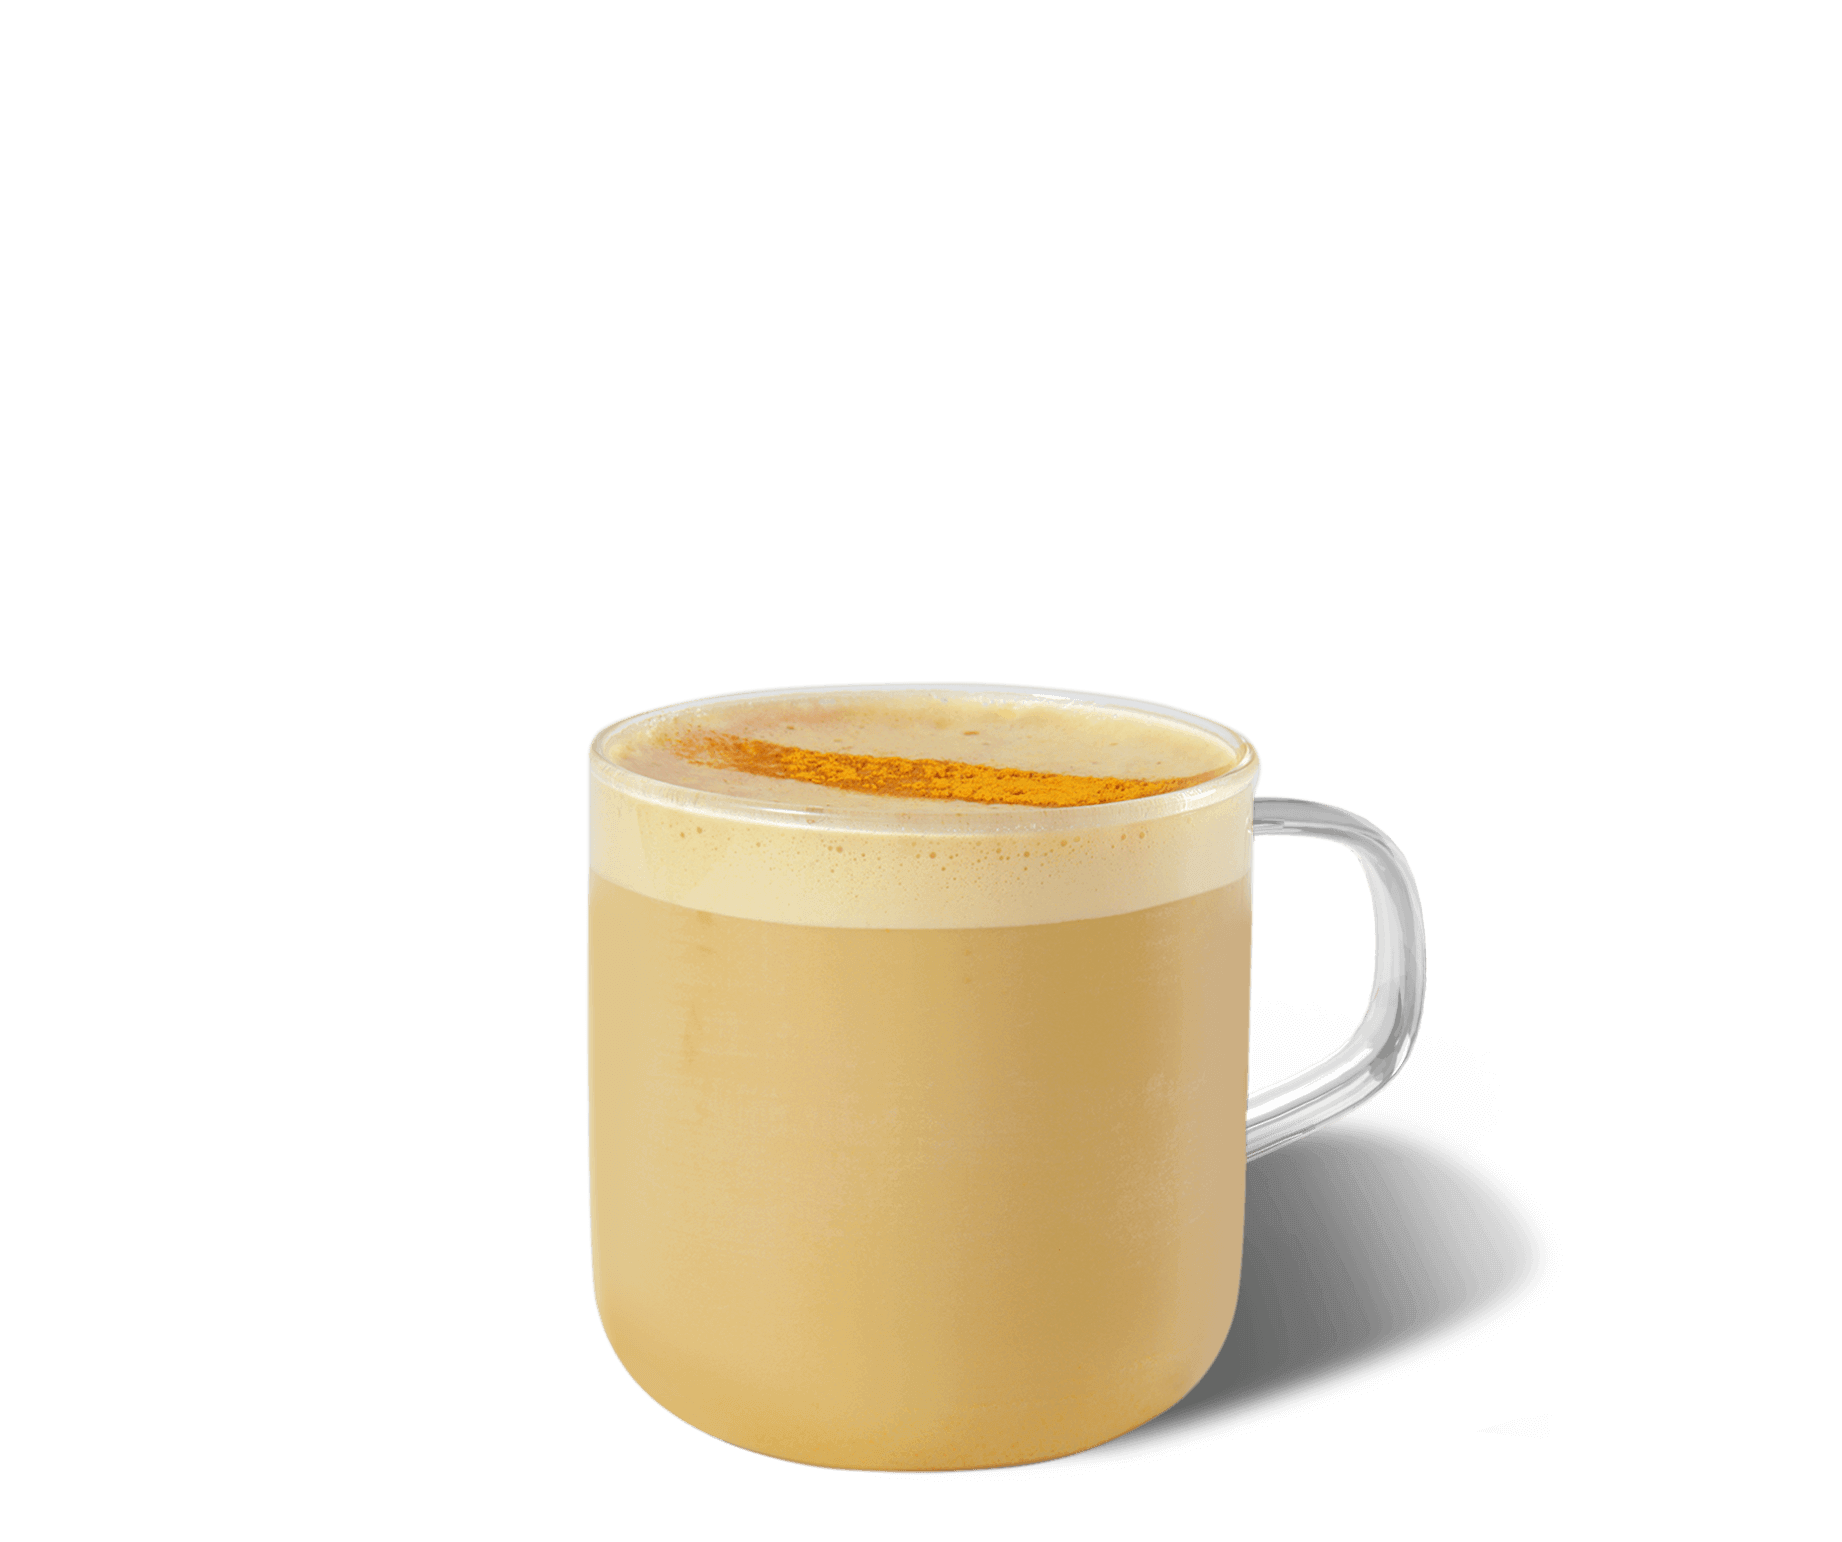 GoldenTurmericLatte_LongShadow_Cream